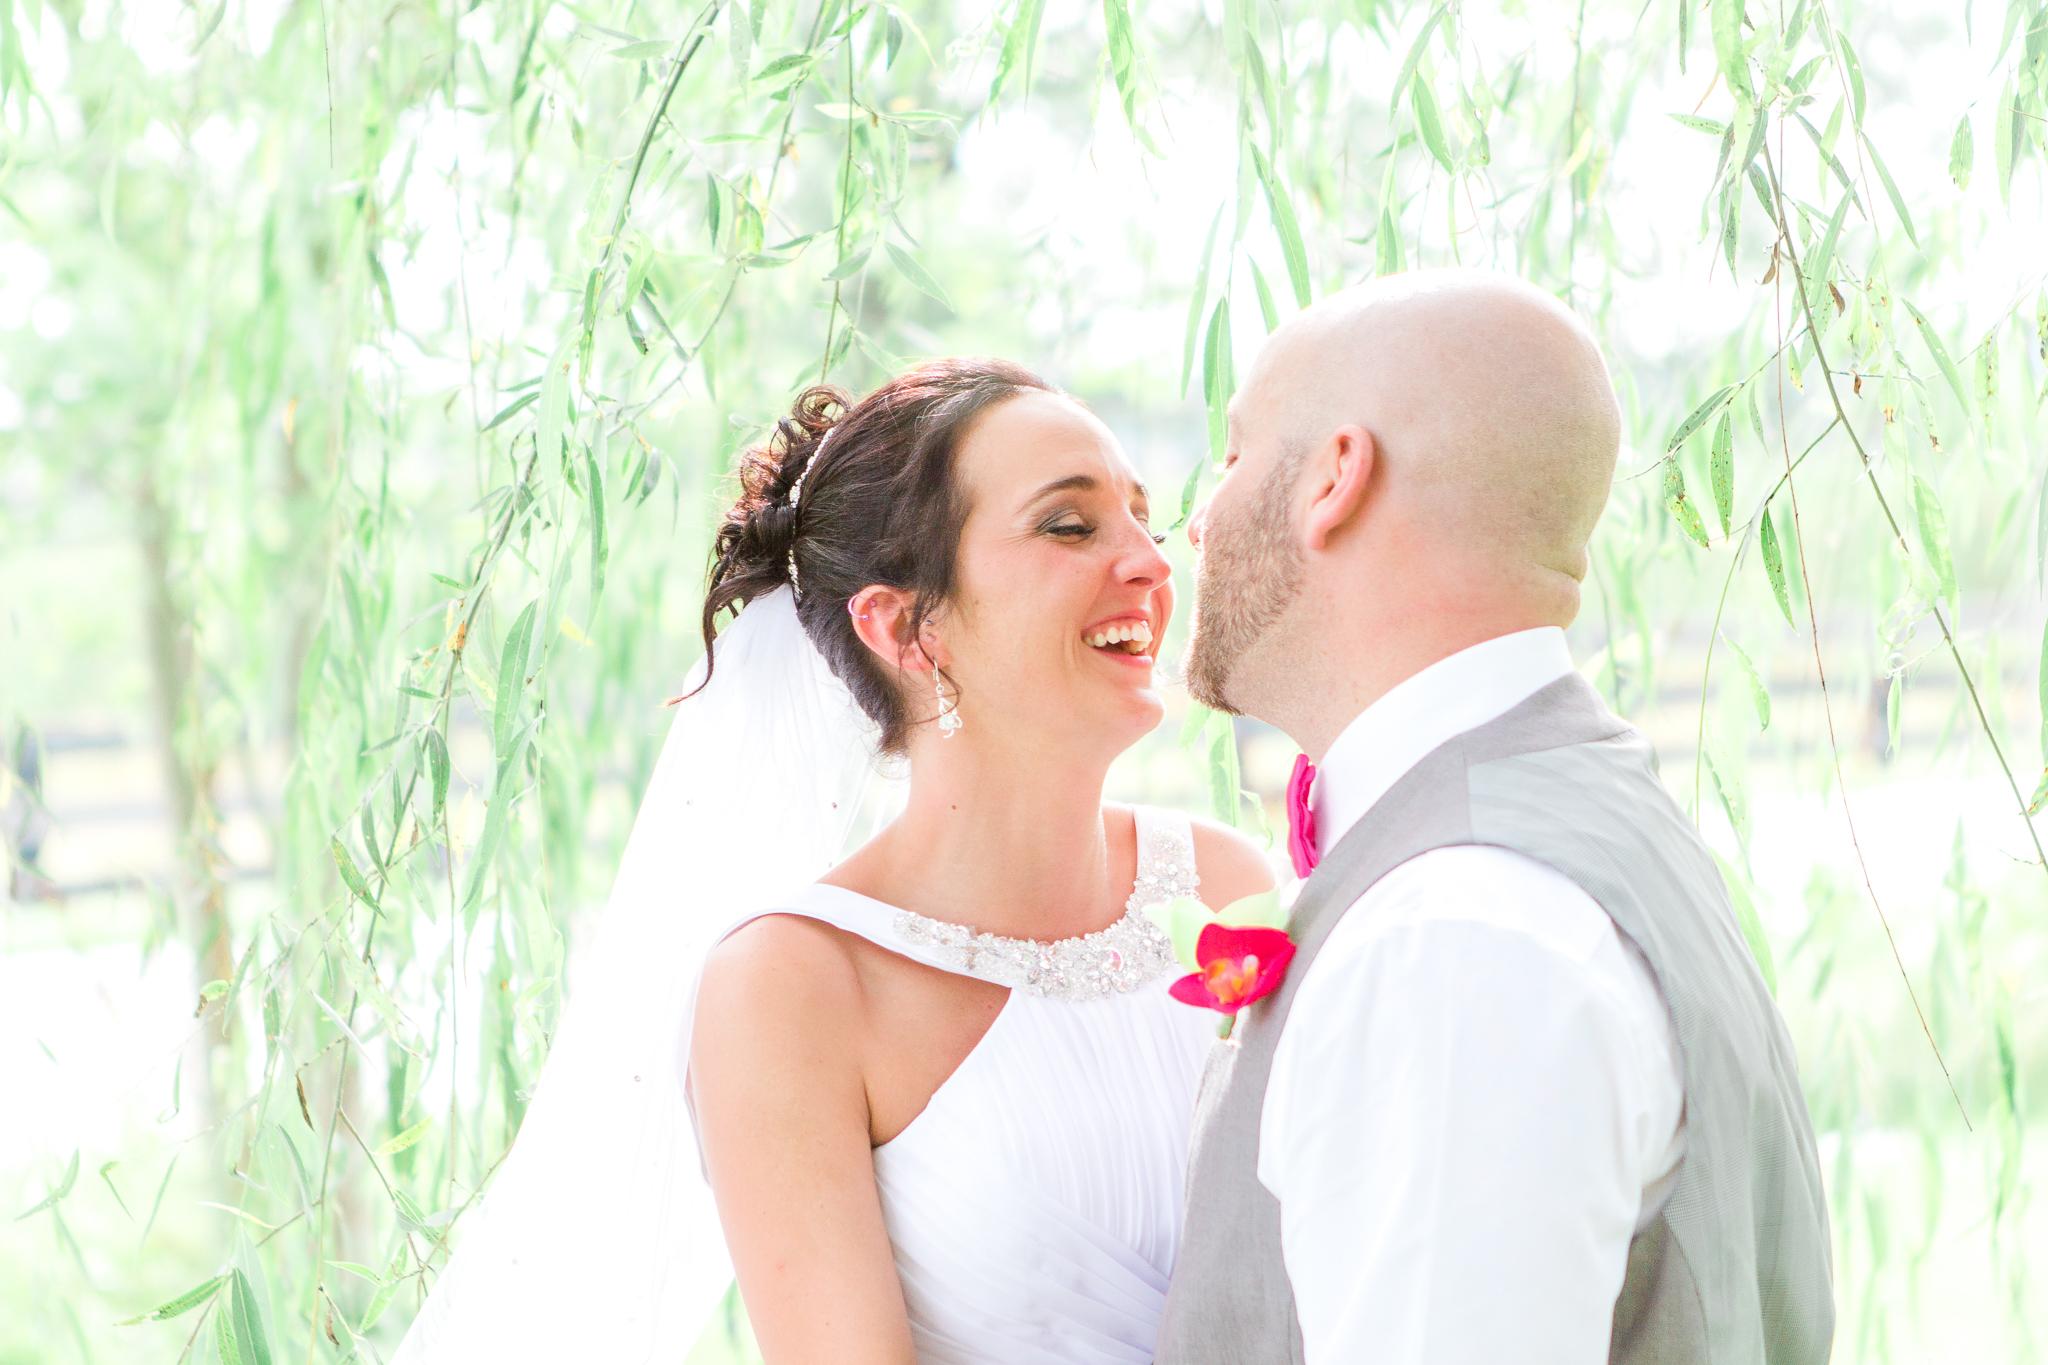 Richmond Kentucky Wedding Photographer - Ariana Jordan Photography -6-2.jpg